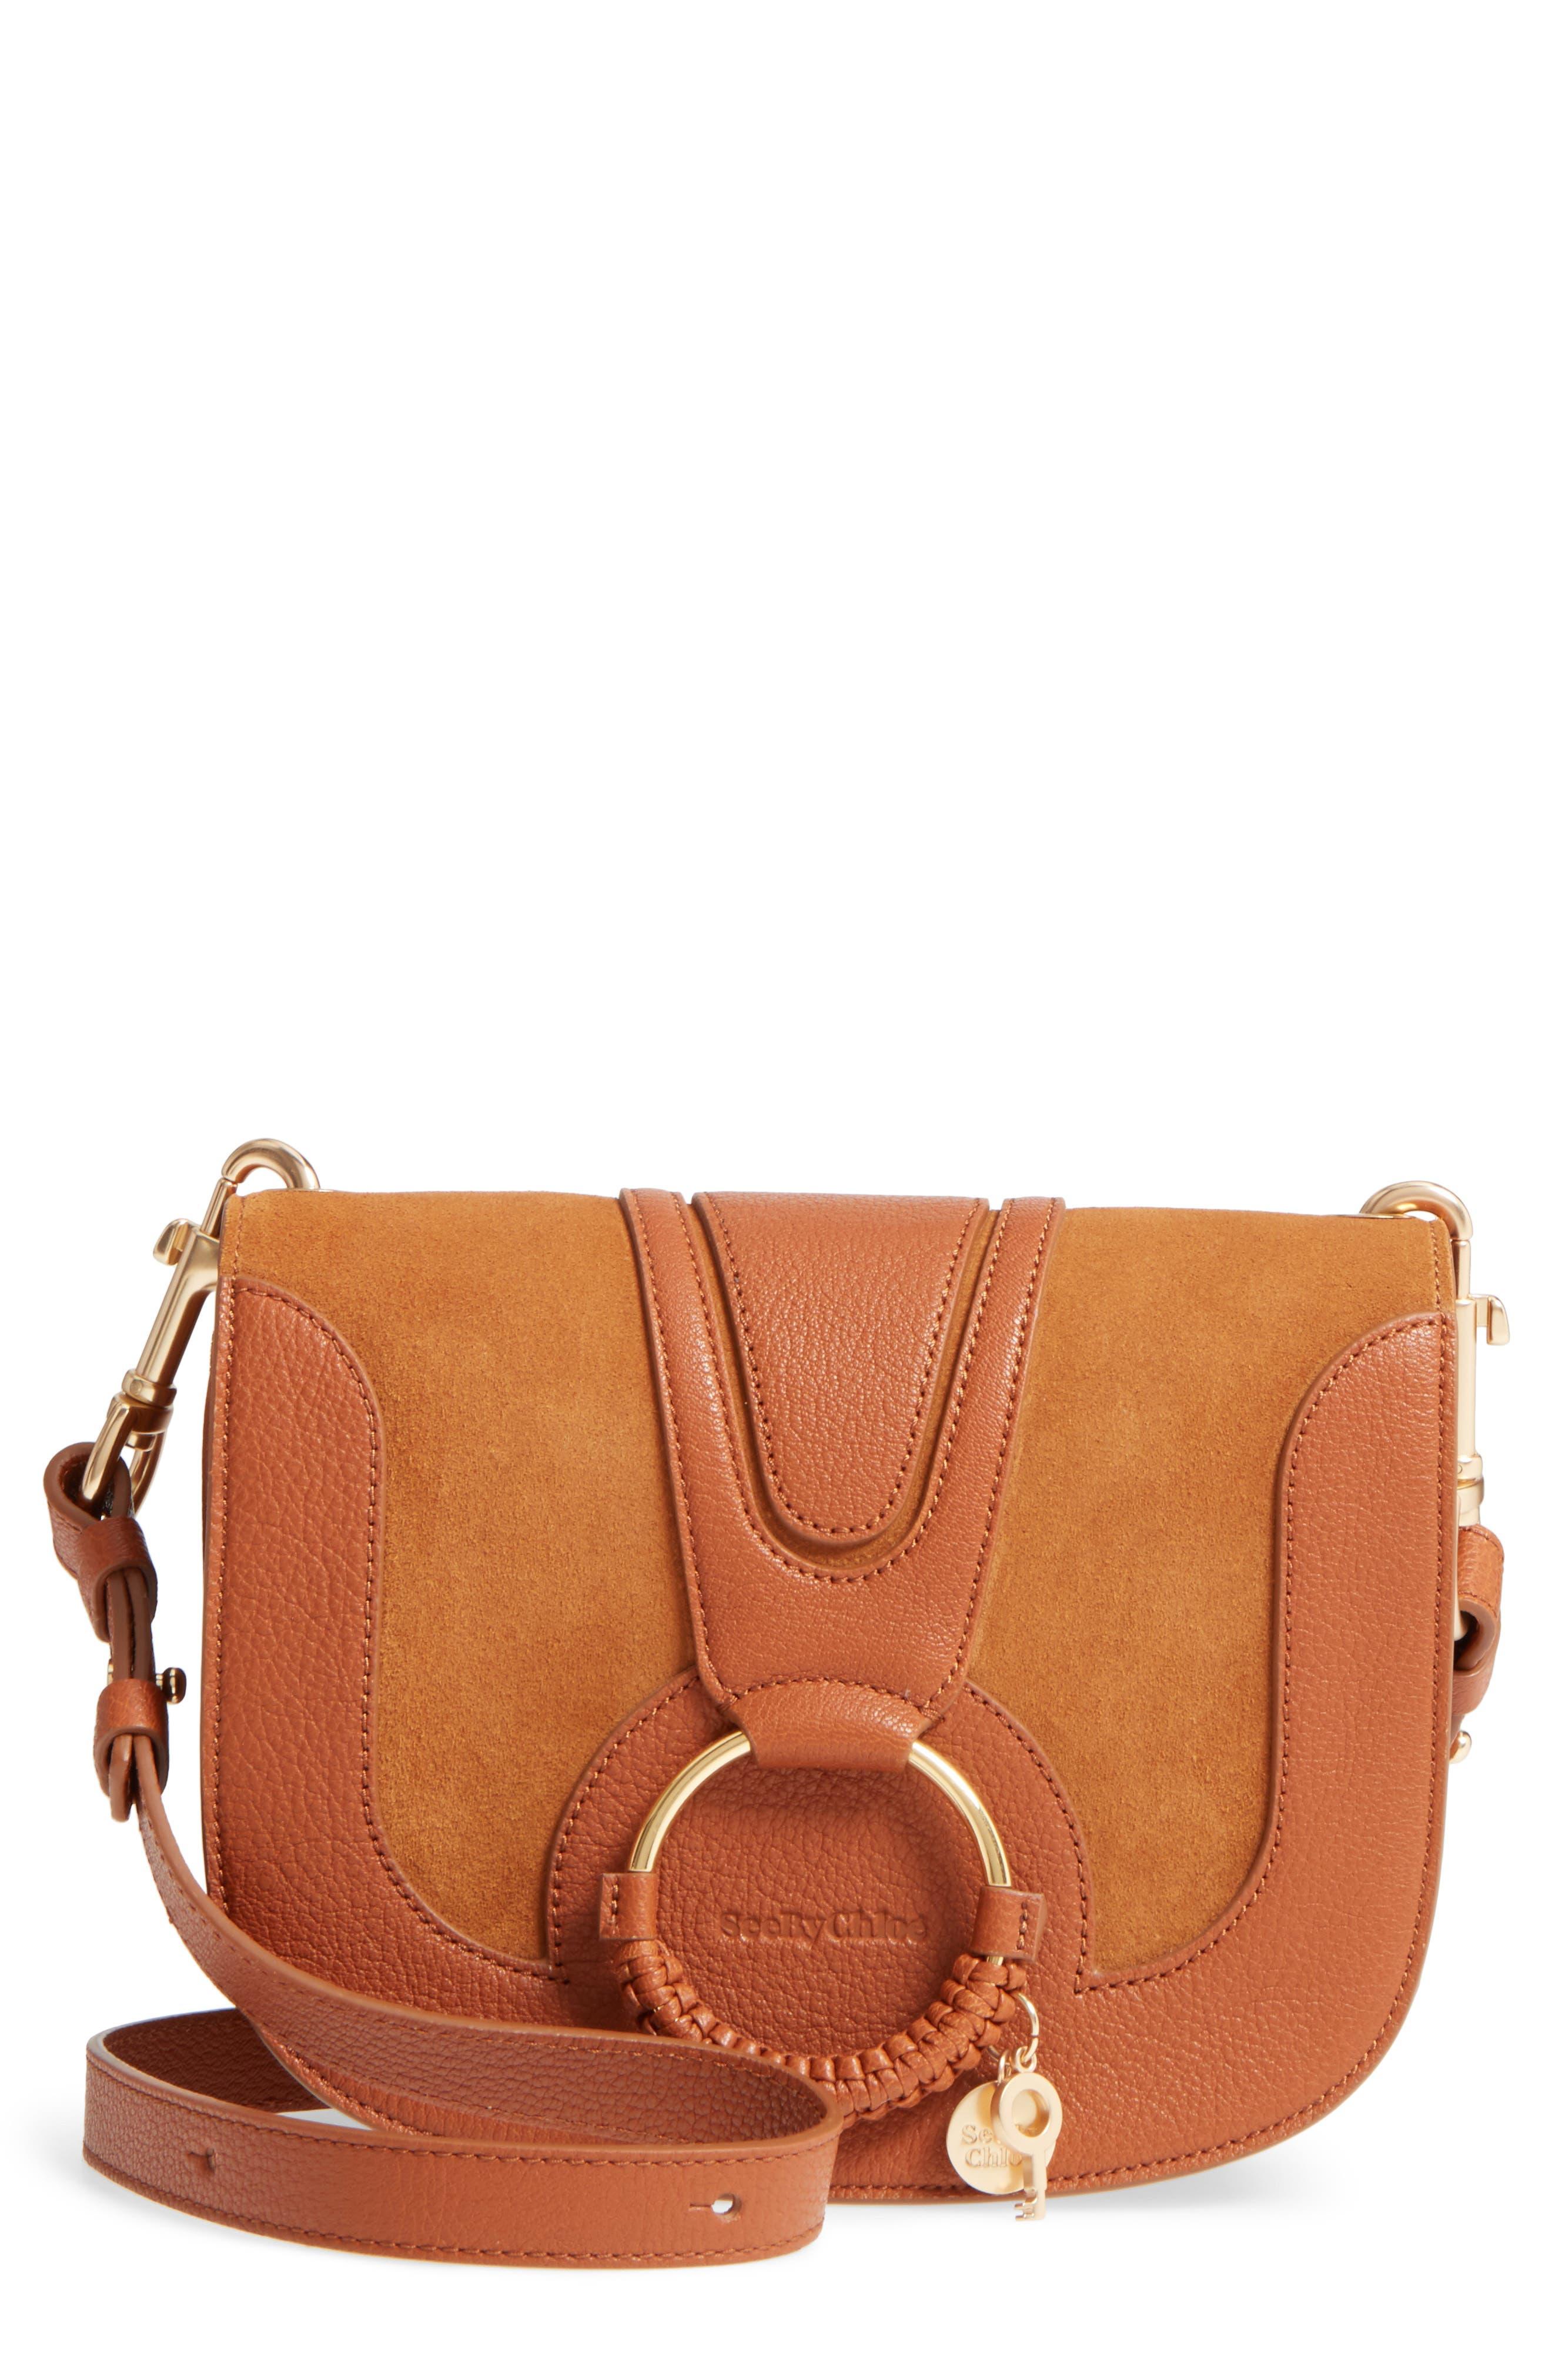 Hana Small Leather Crossbody Bag,                             Main thumbnail 1, color,